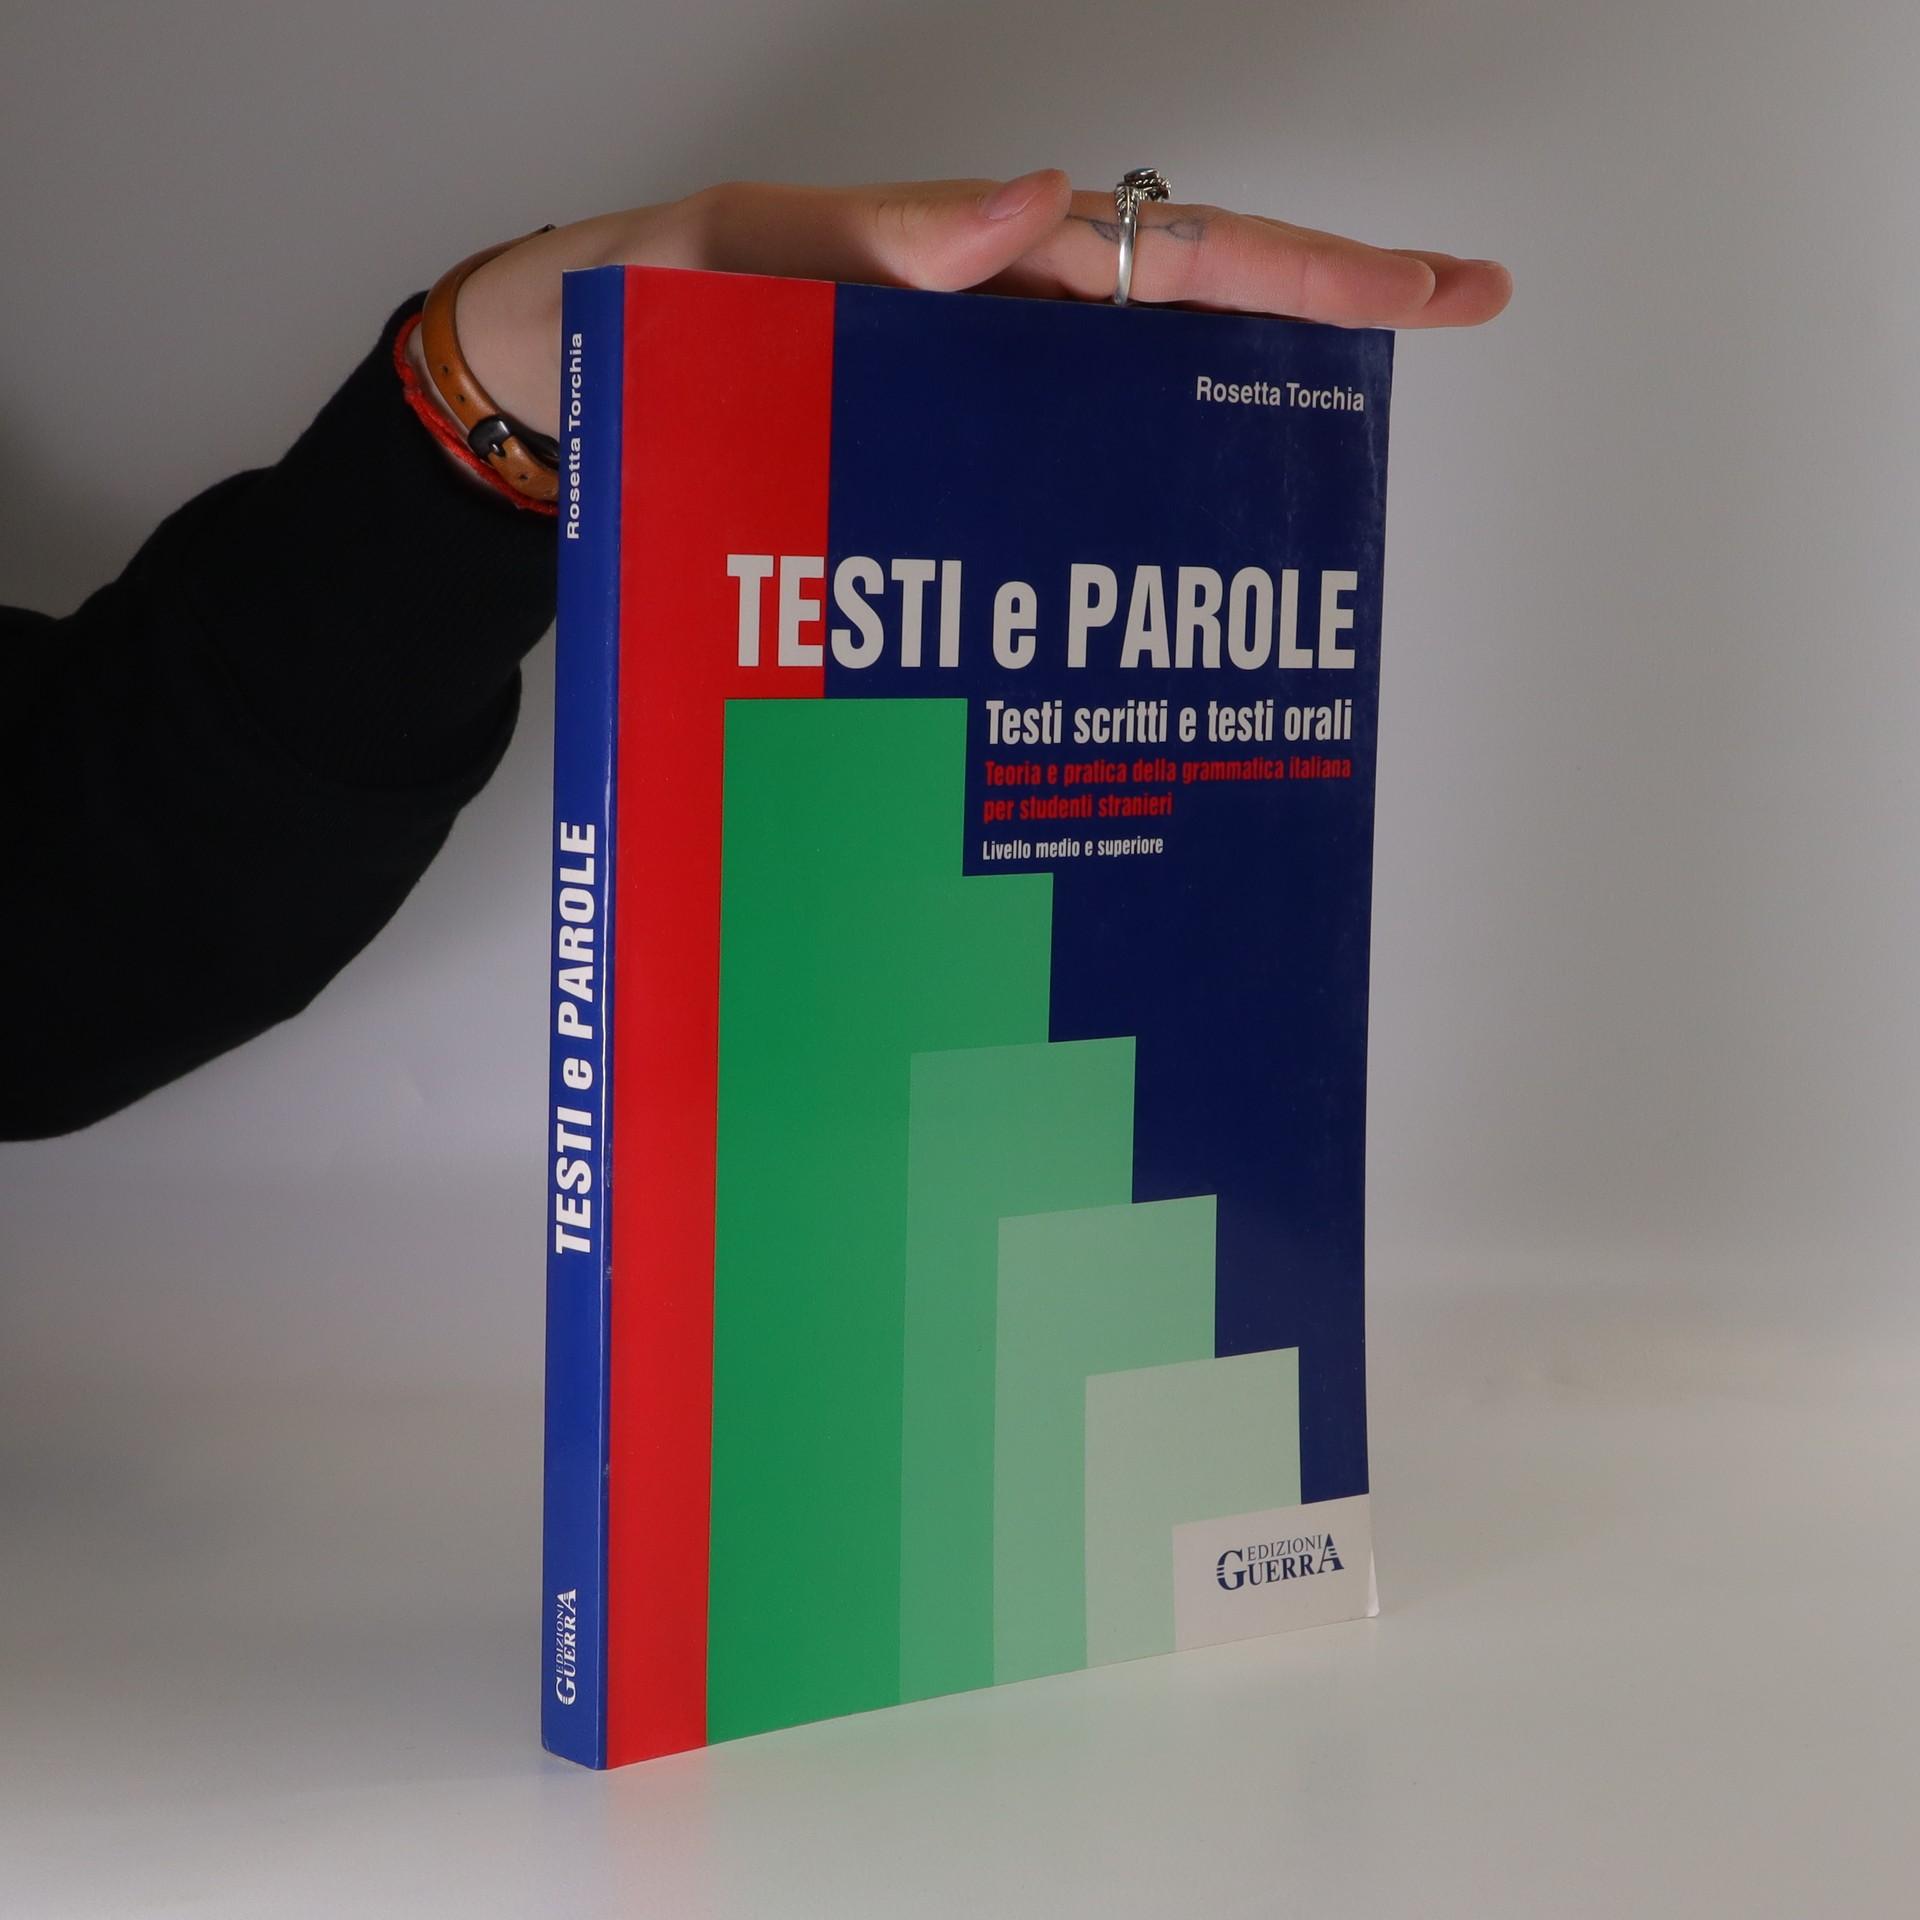 antikvární kniha Testi e parole : testi scritti e testi orali, 2003